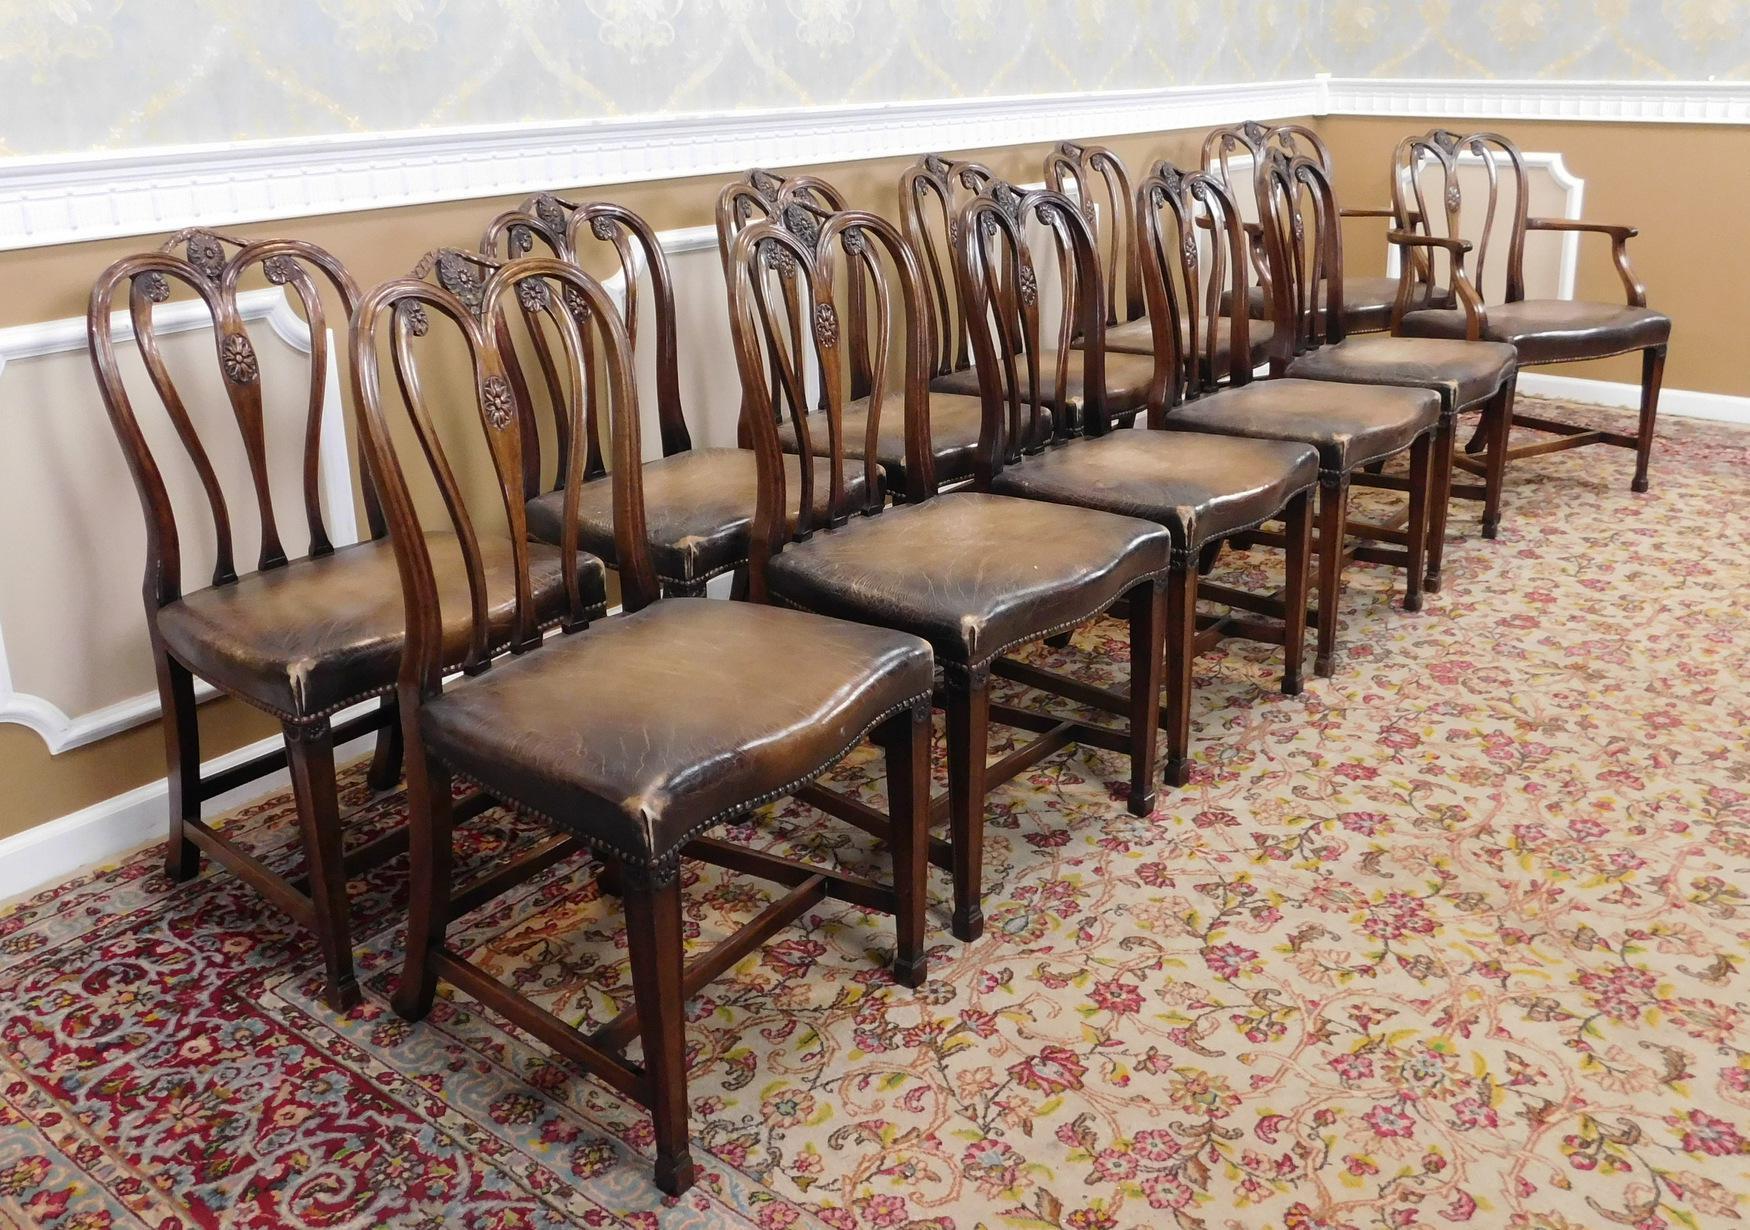 1930s Carved Mahogany Sheraton Style Dining Chairs Set  : dbc8ca5f 1c41 4106 9f25 db4c4ca5fc6baspectfitampwidth640ampheight640 from www.chairish.com size 640 x 640 jpeg 76kB